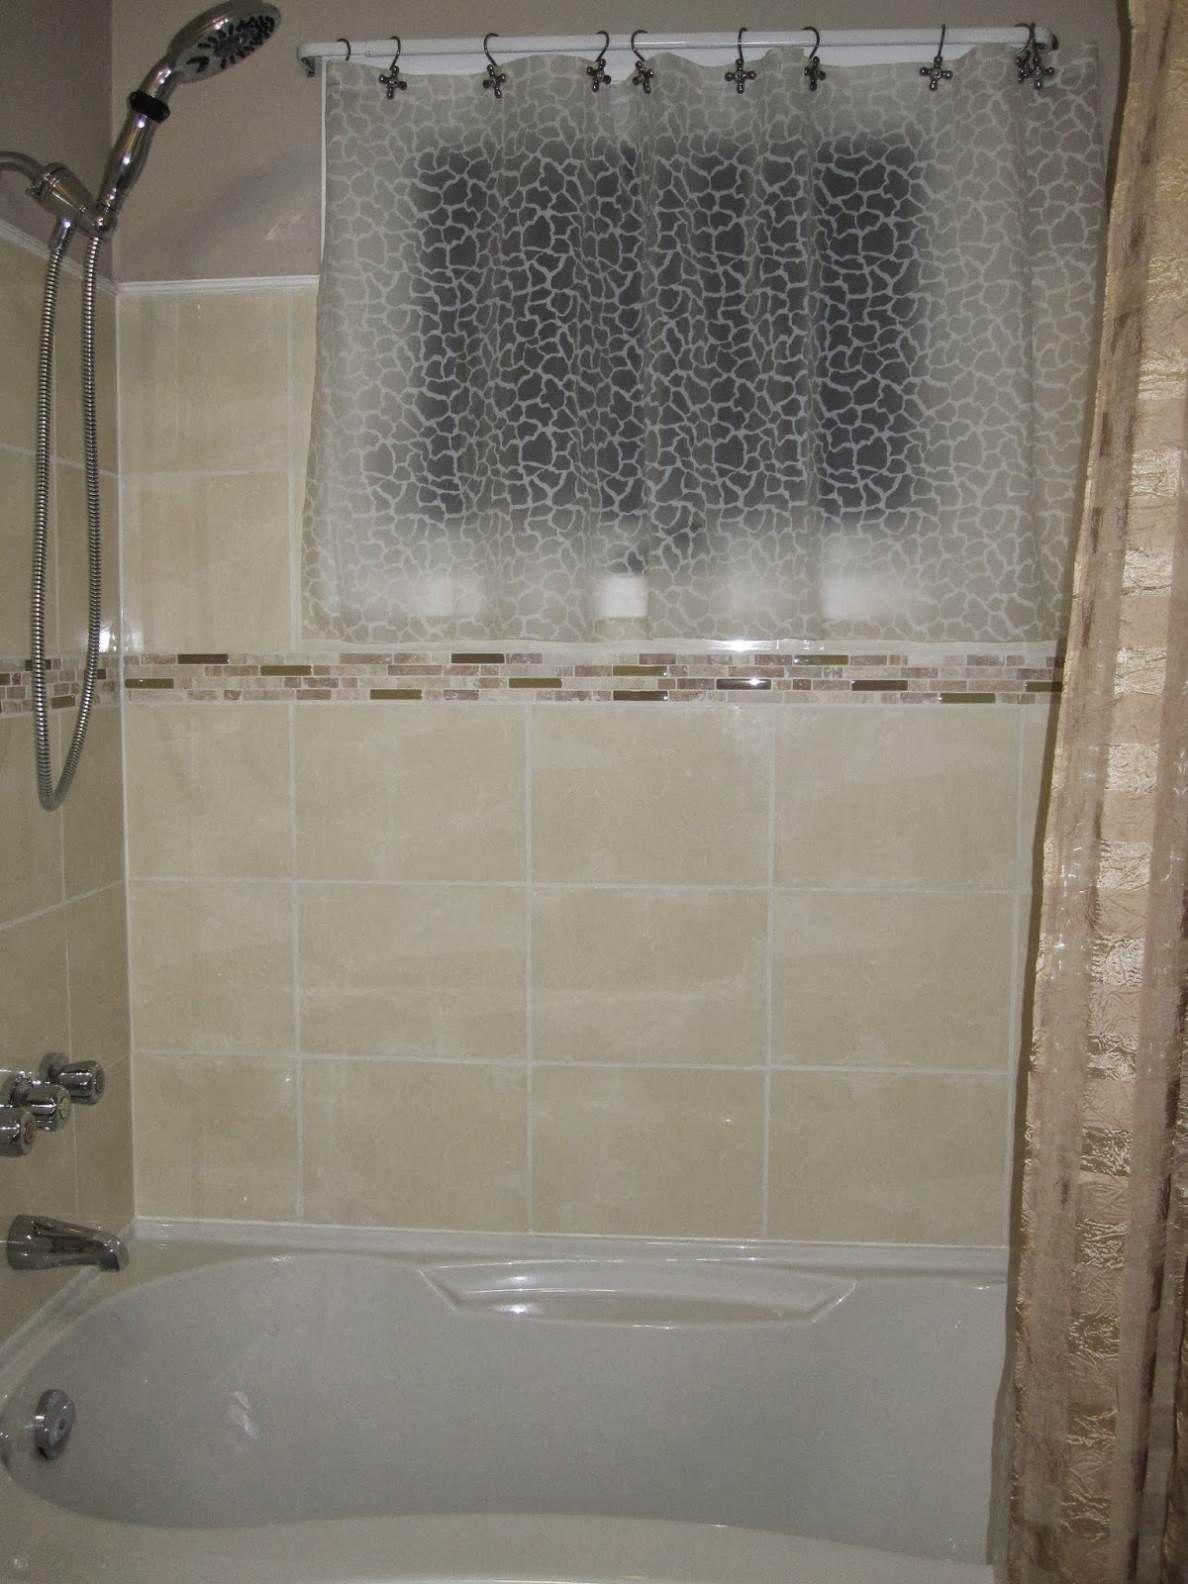 curtain for window inside shower